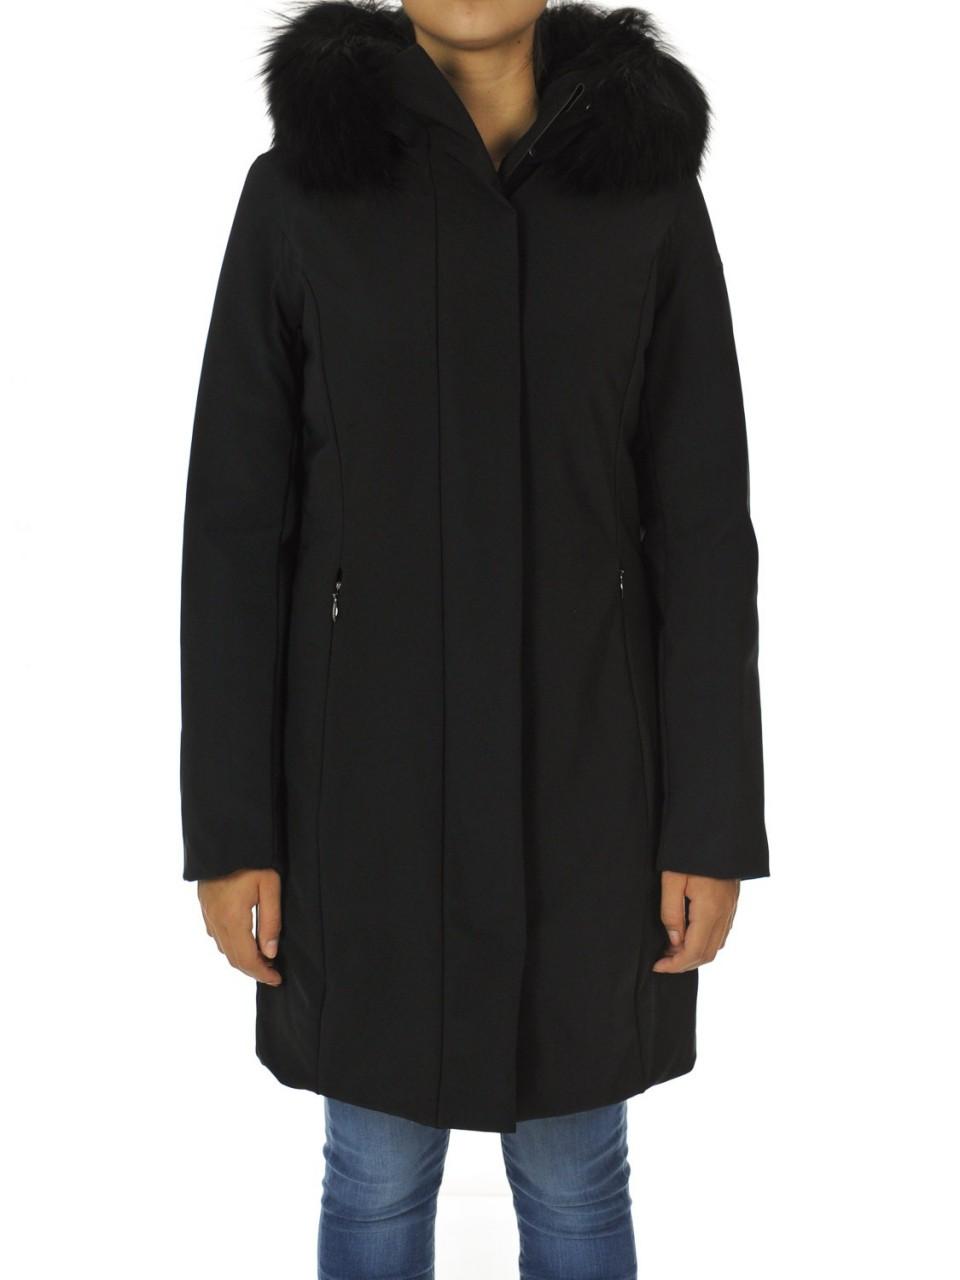 Rrd Donna Giacca Roberto Ricci Design Donna Winter Longlady Fur W18501I